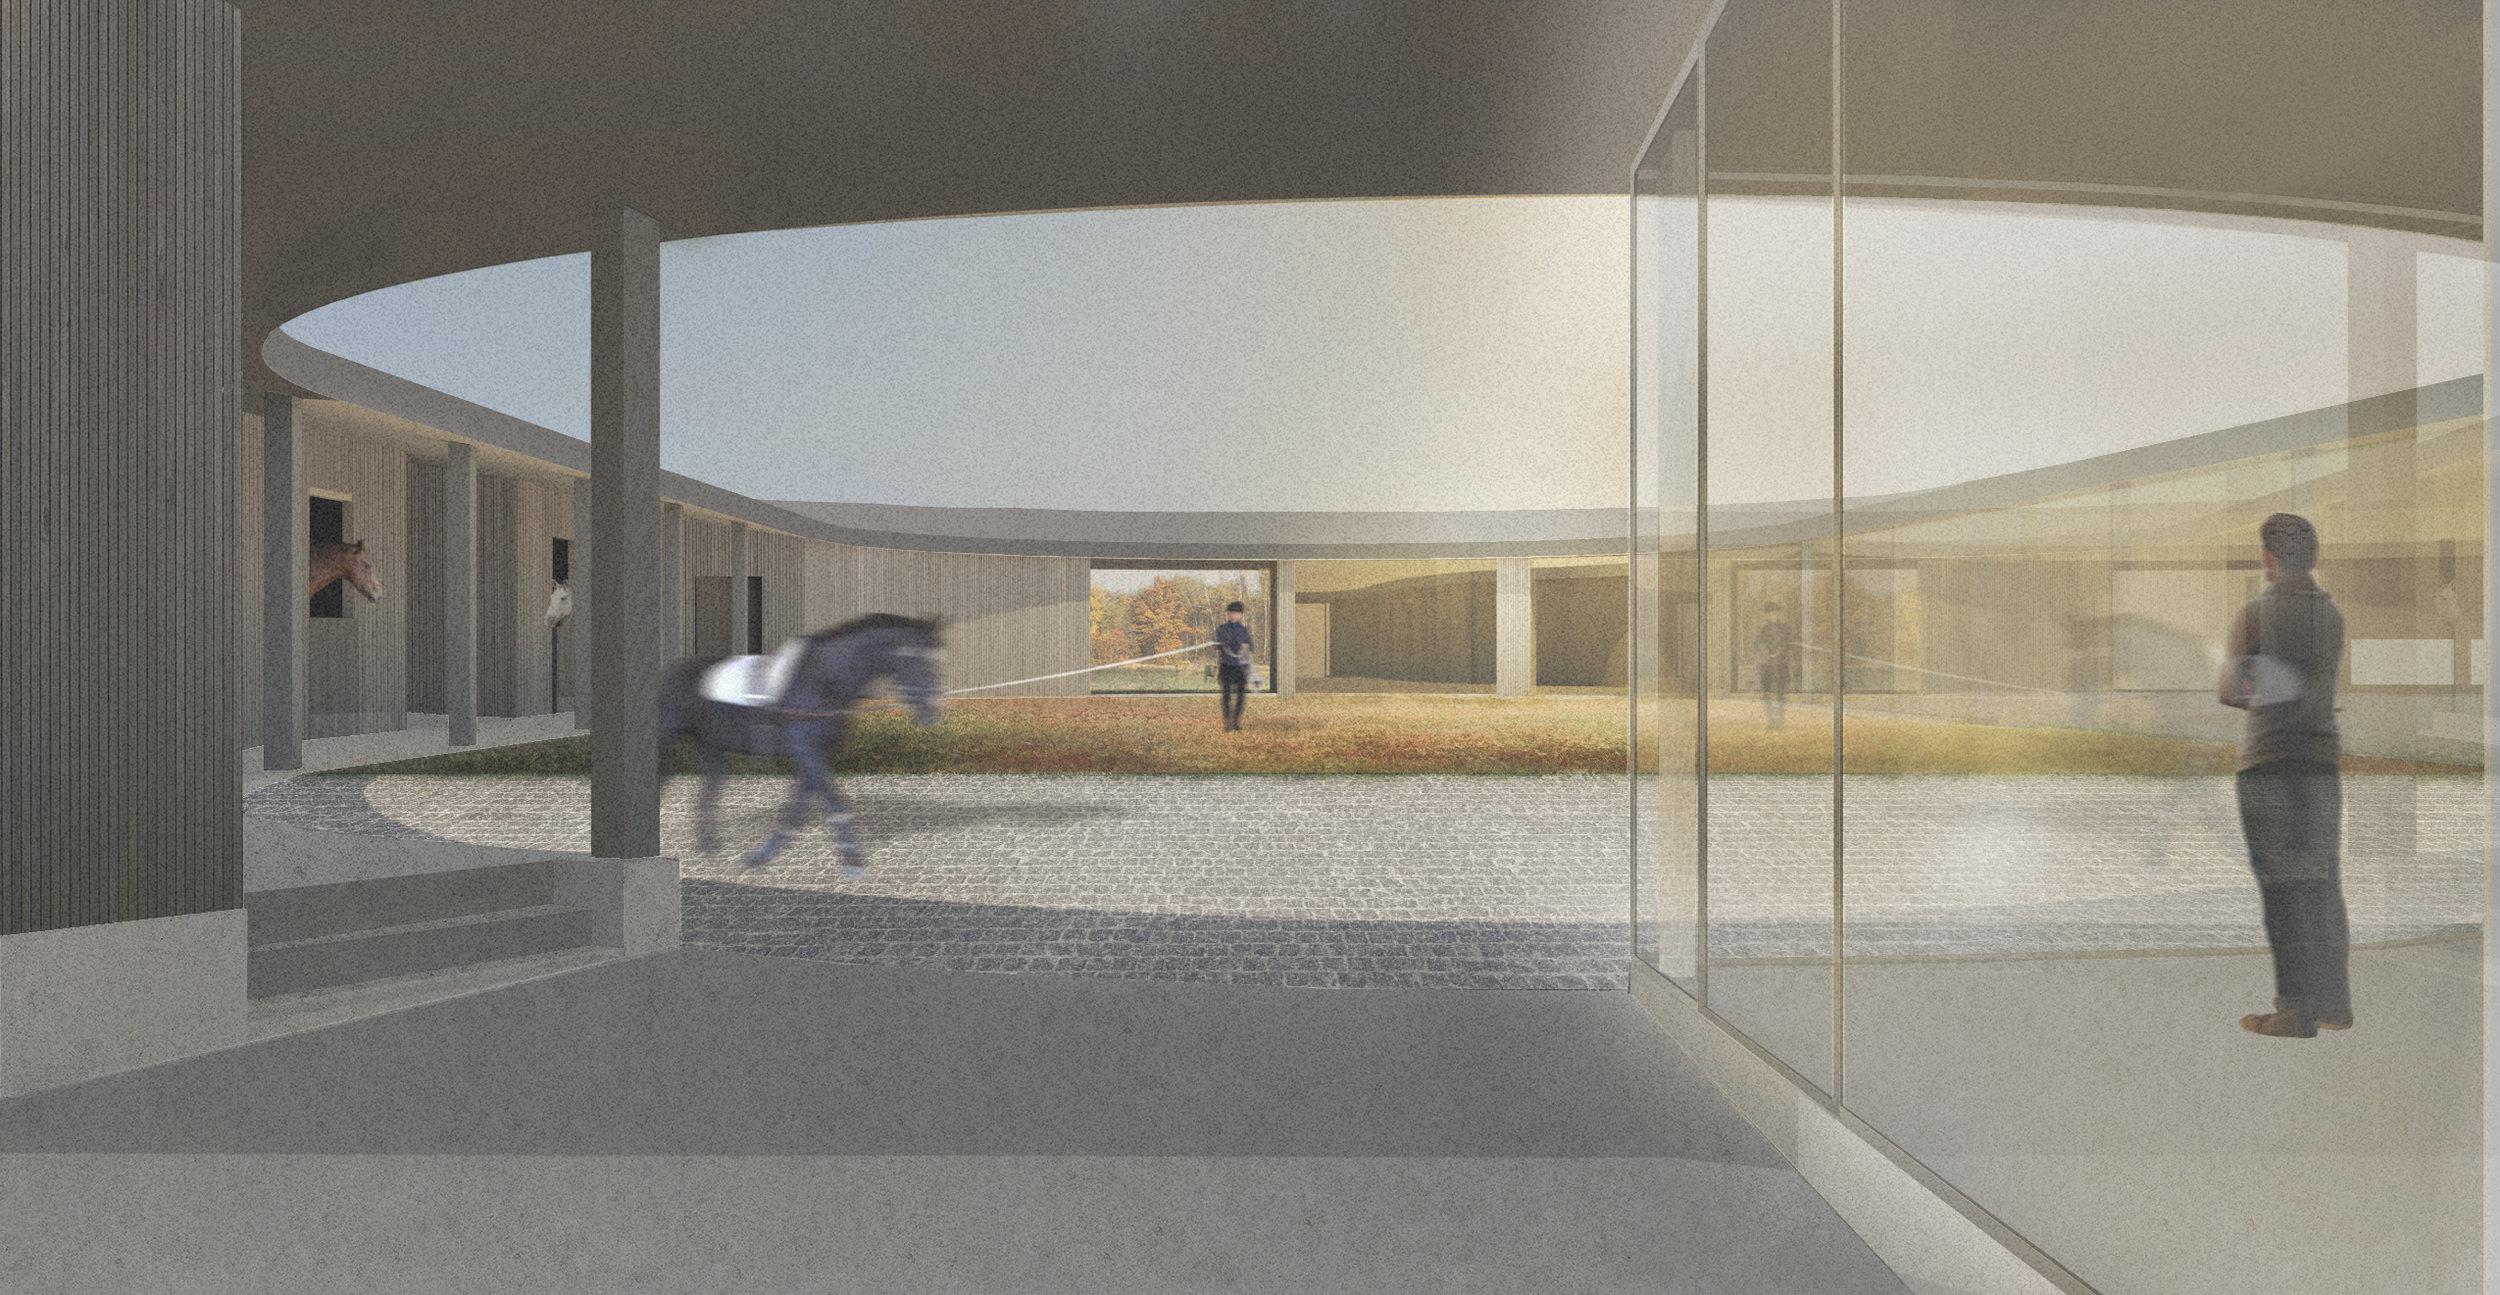 Entrance_East.3.jpg